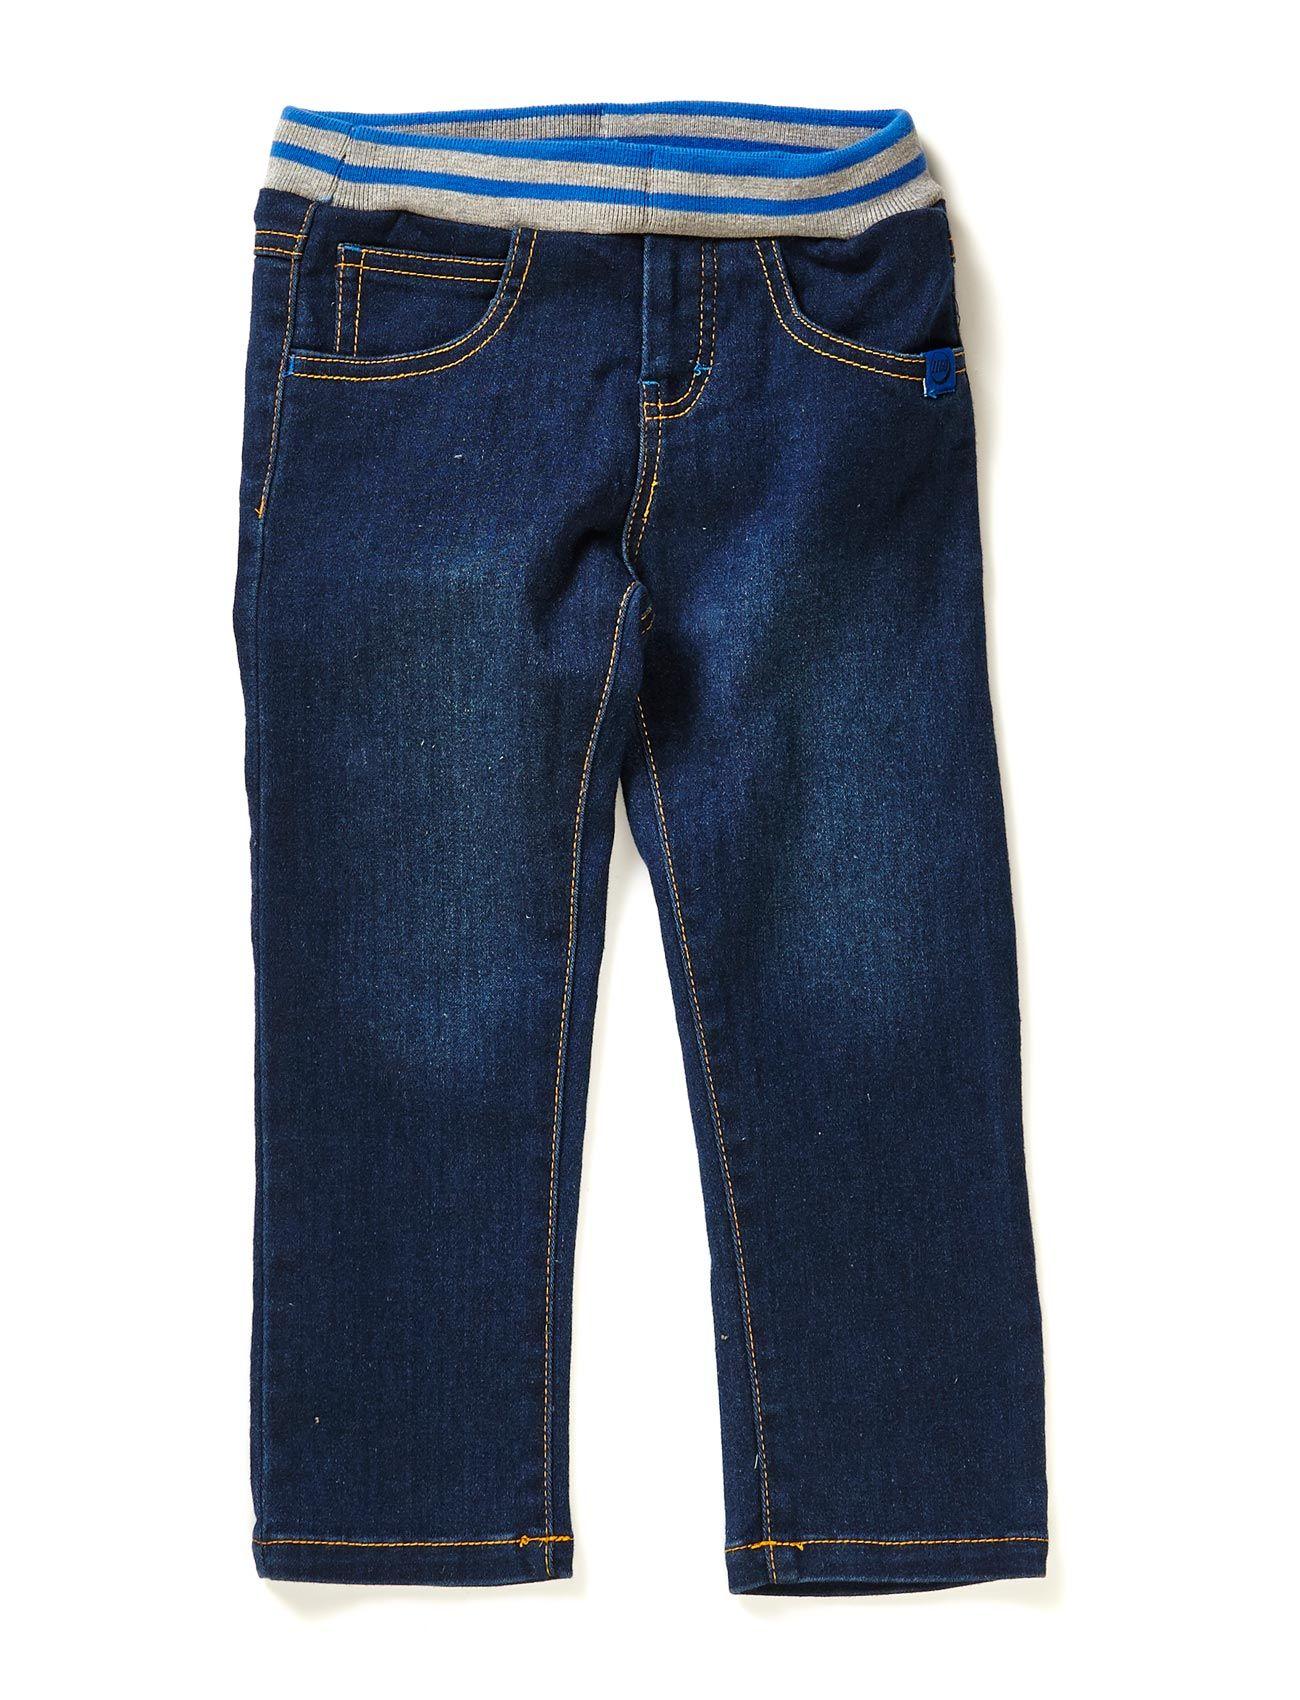 lego wear – Imagine 504 - jeans på boozt.com dk